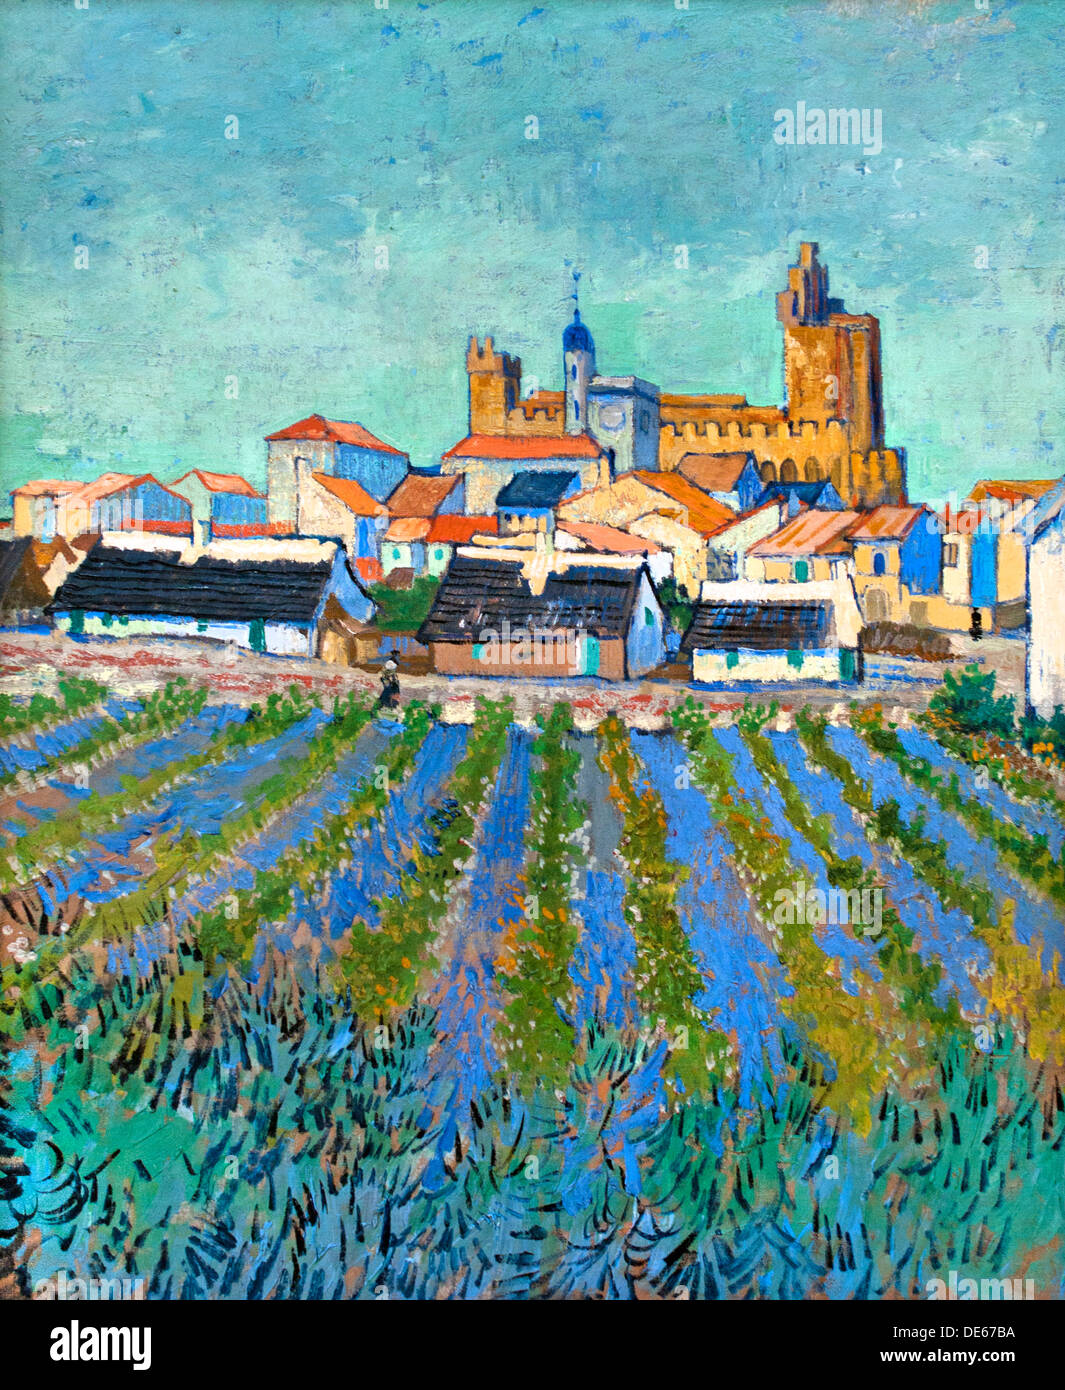 Vieuw of Saintes Maries de la Mer !888 Vincent van Gogh 1853 - 1890  Dutch Netherlands - Stock Image